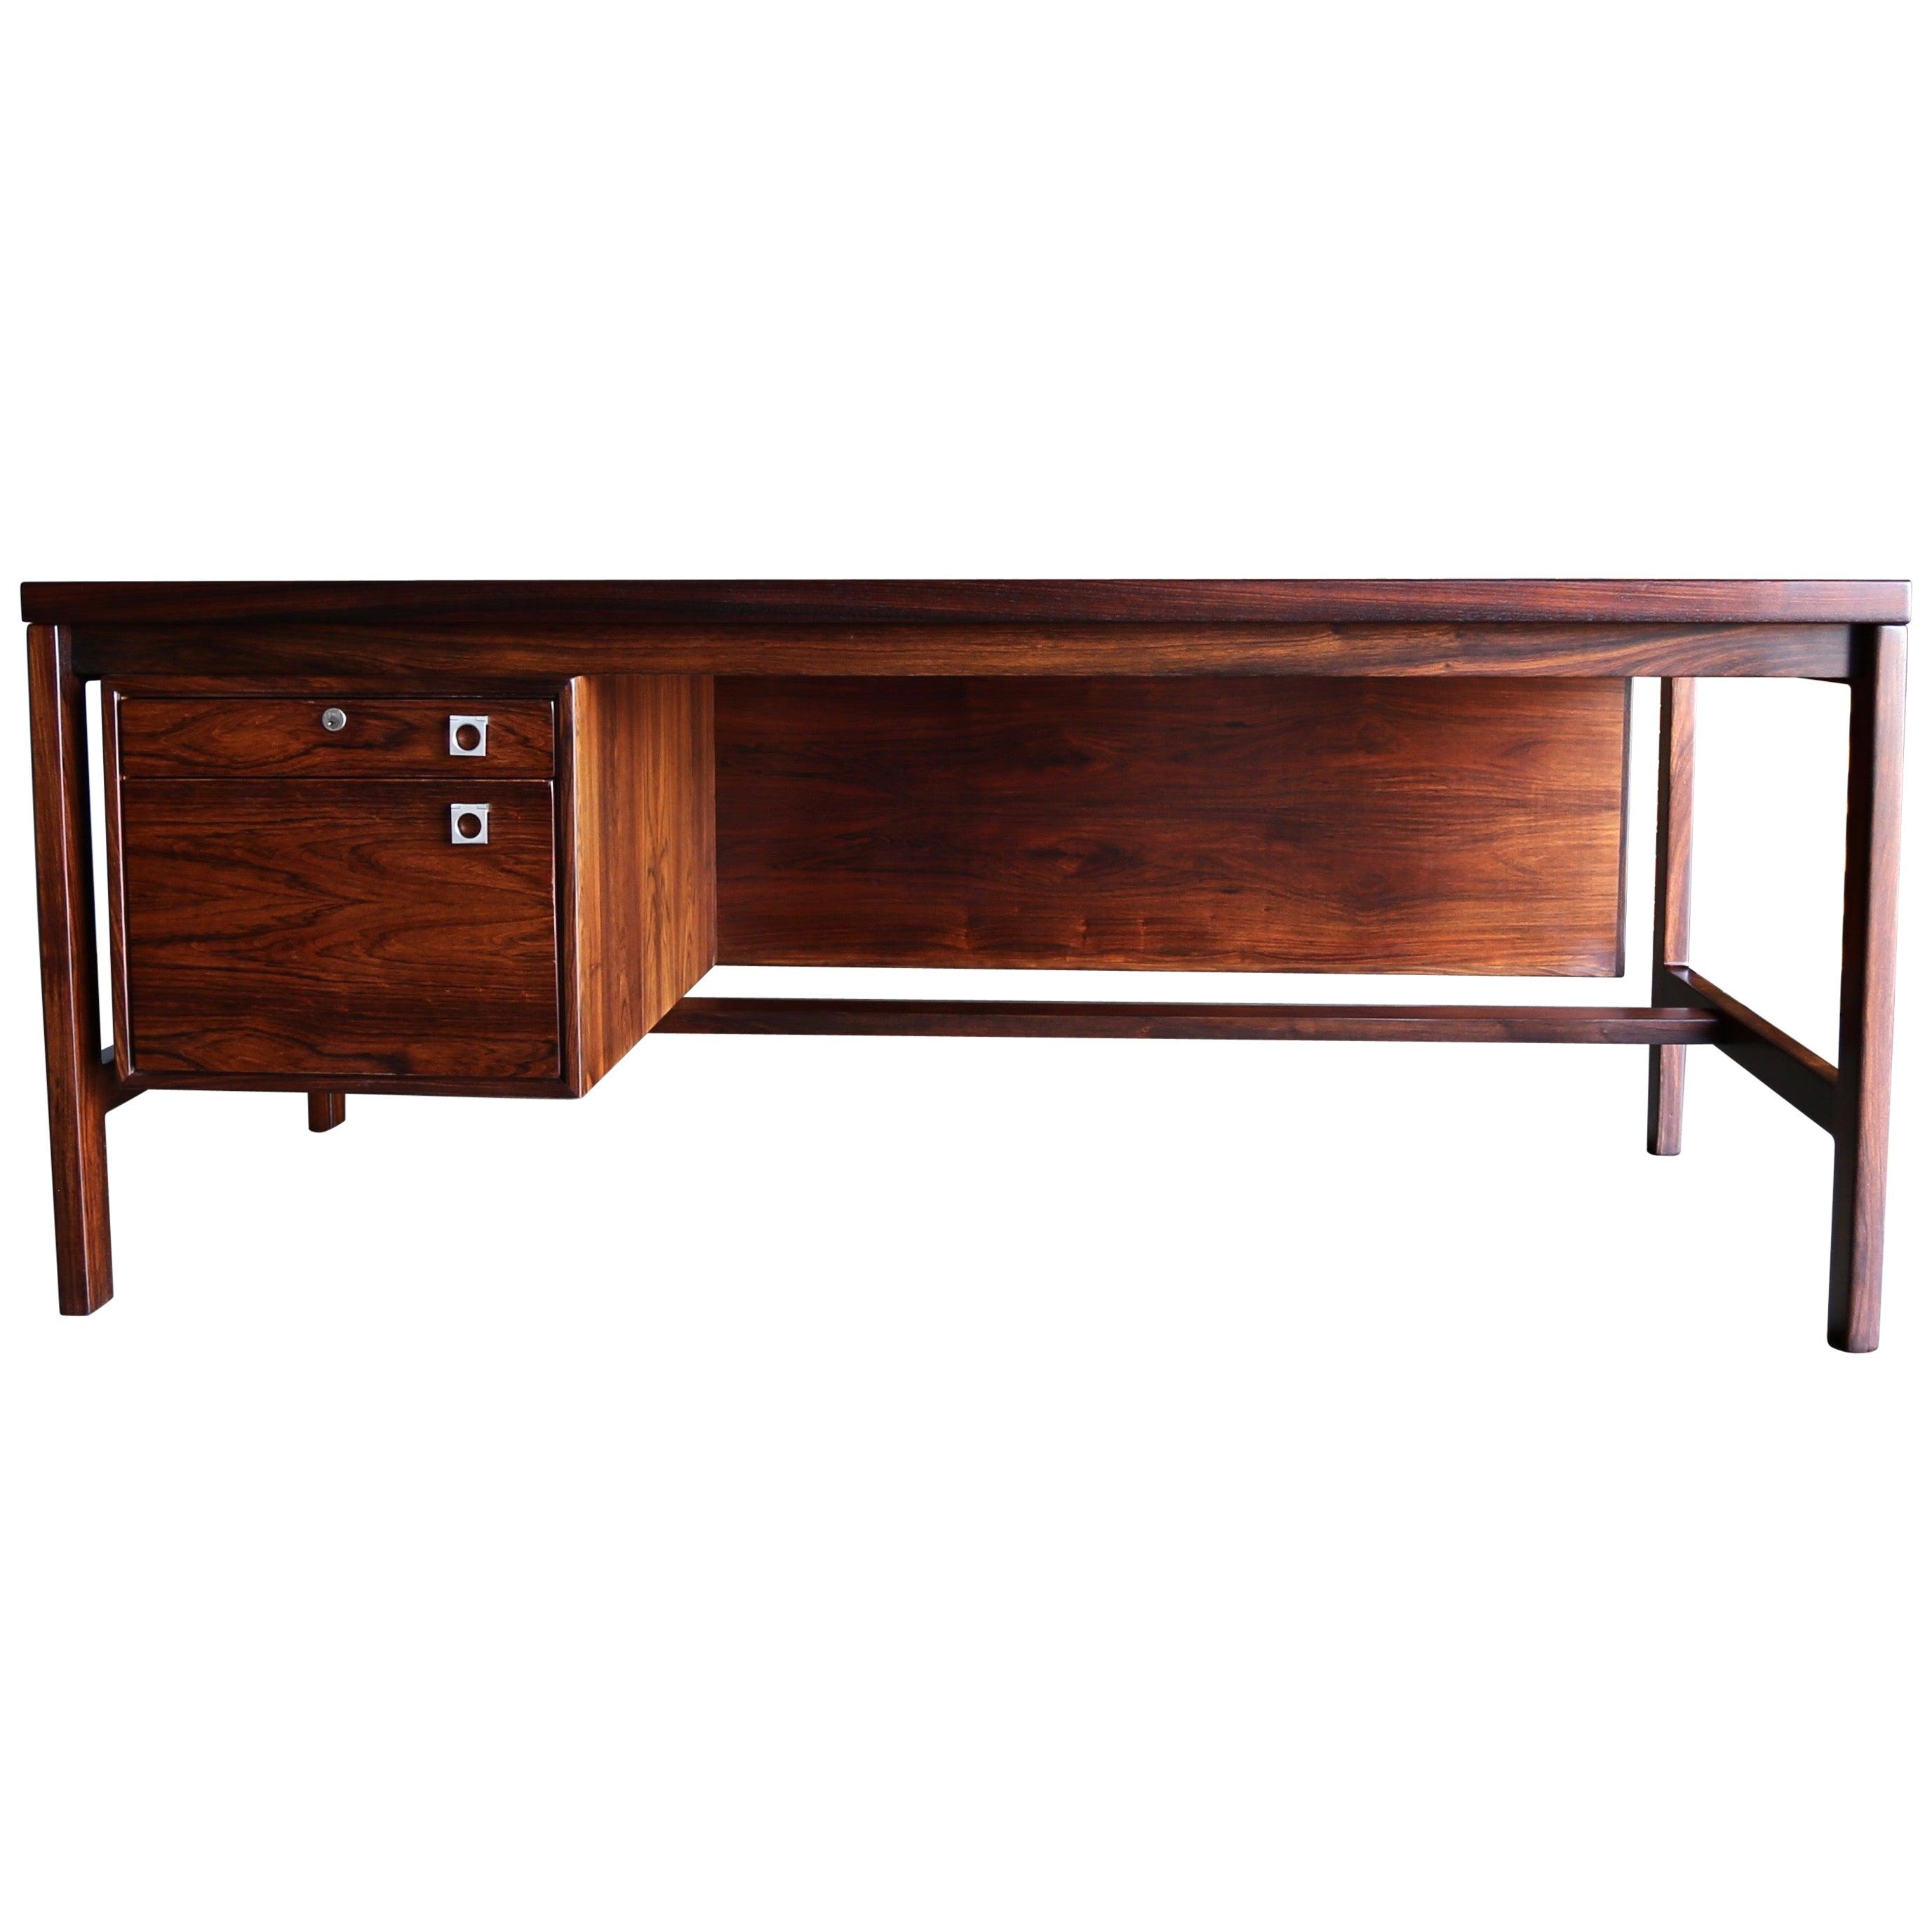 Arne Vodder Rosewood Desk for H.P. Hansen, circa 1960